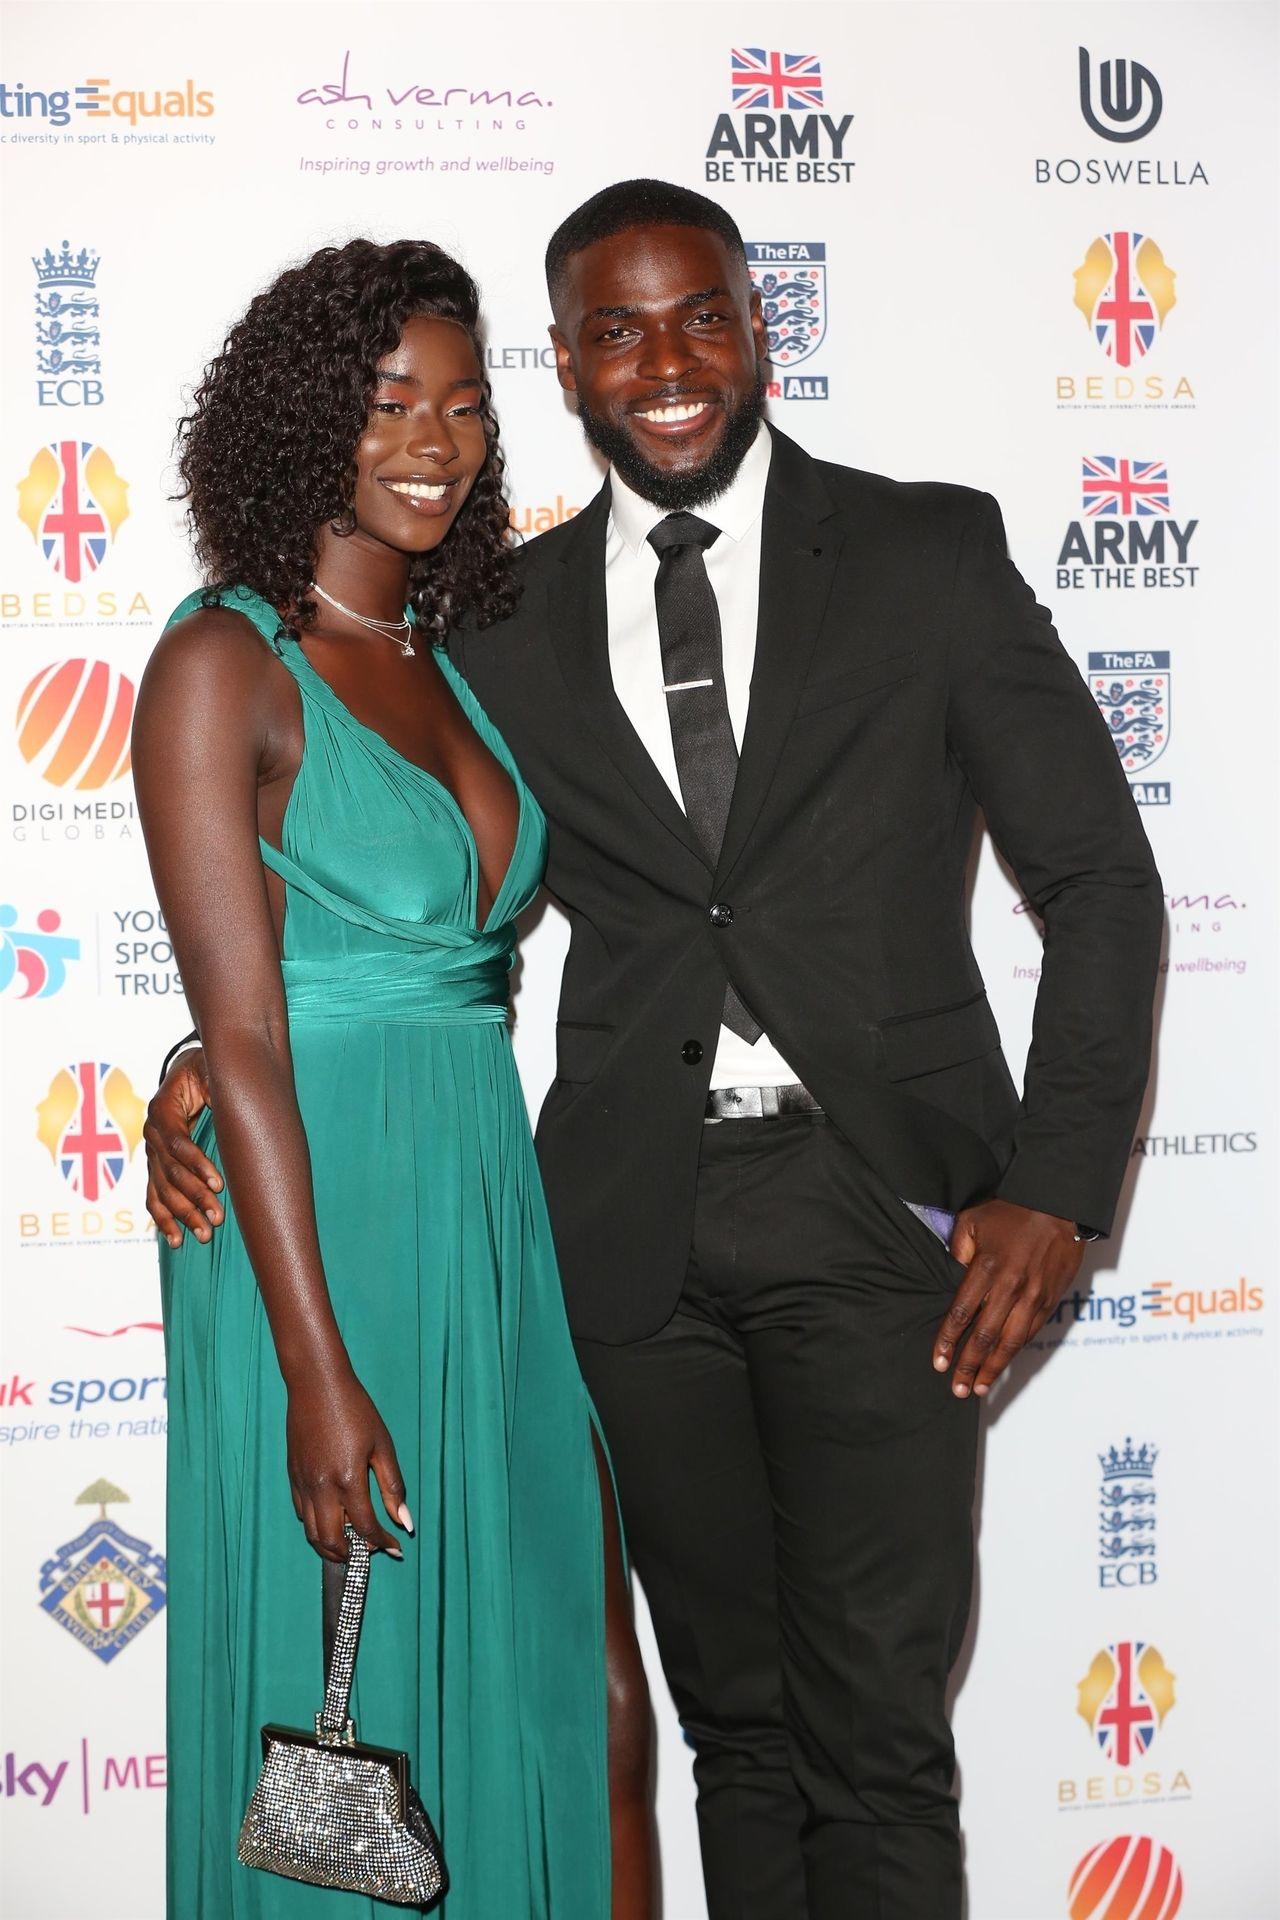 Mike Boateng & Priscilla Anyabu Are Seen At British Ethnic Diversity Sports Awards 0003